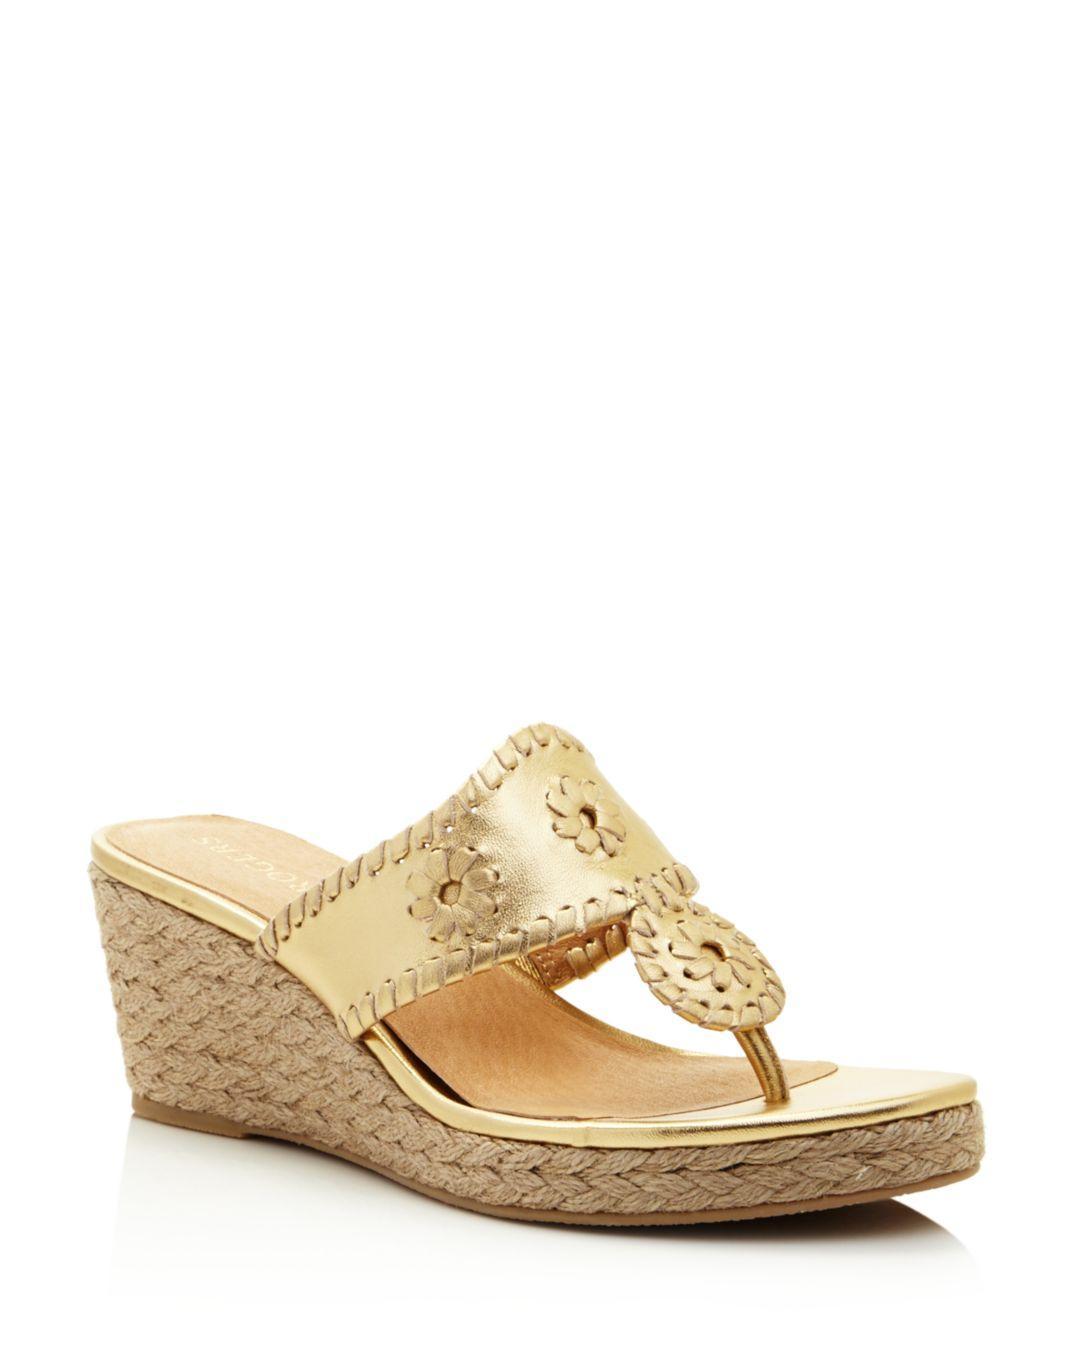 c960a5f8b Jack Rogers Women s Jacks Espadrille Wedge Sandals in Metallic - Lyst